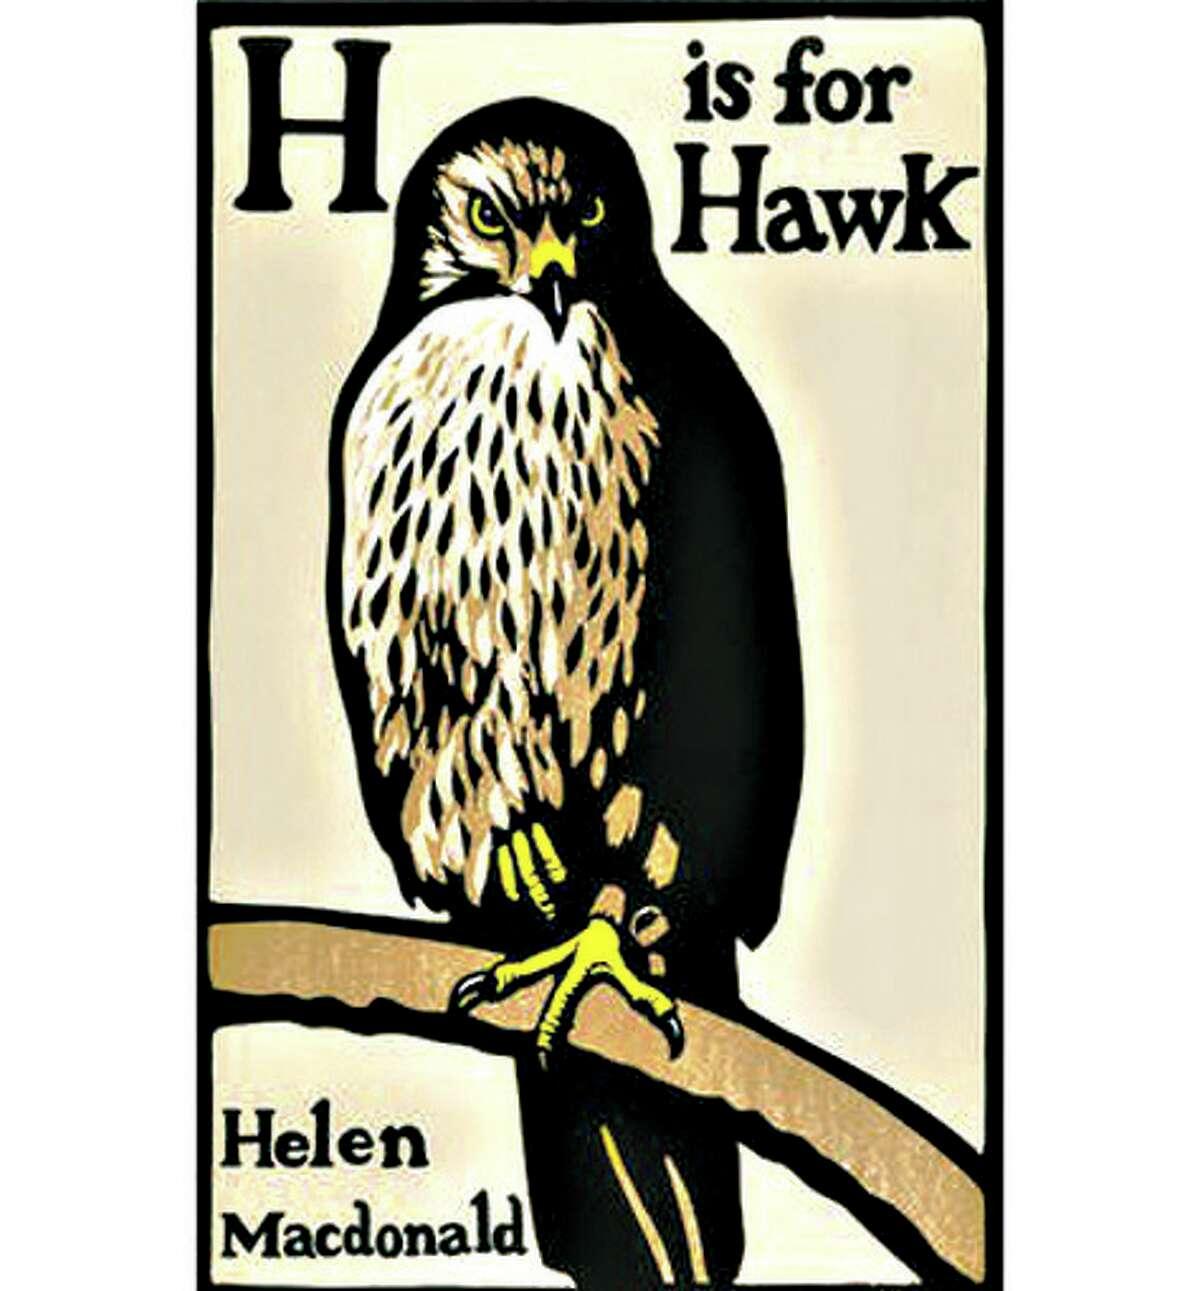 ?H is For Hawk? (Grove Press, 2014) by Helen Macdonald